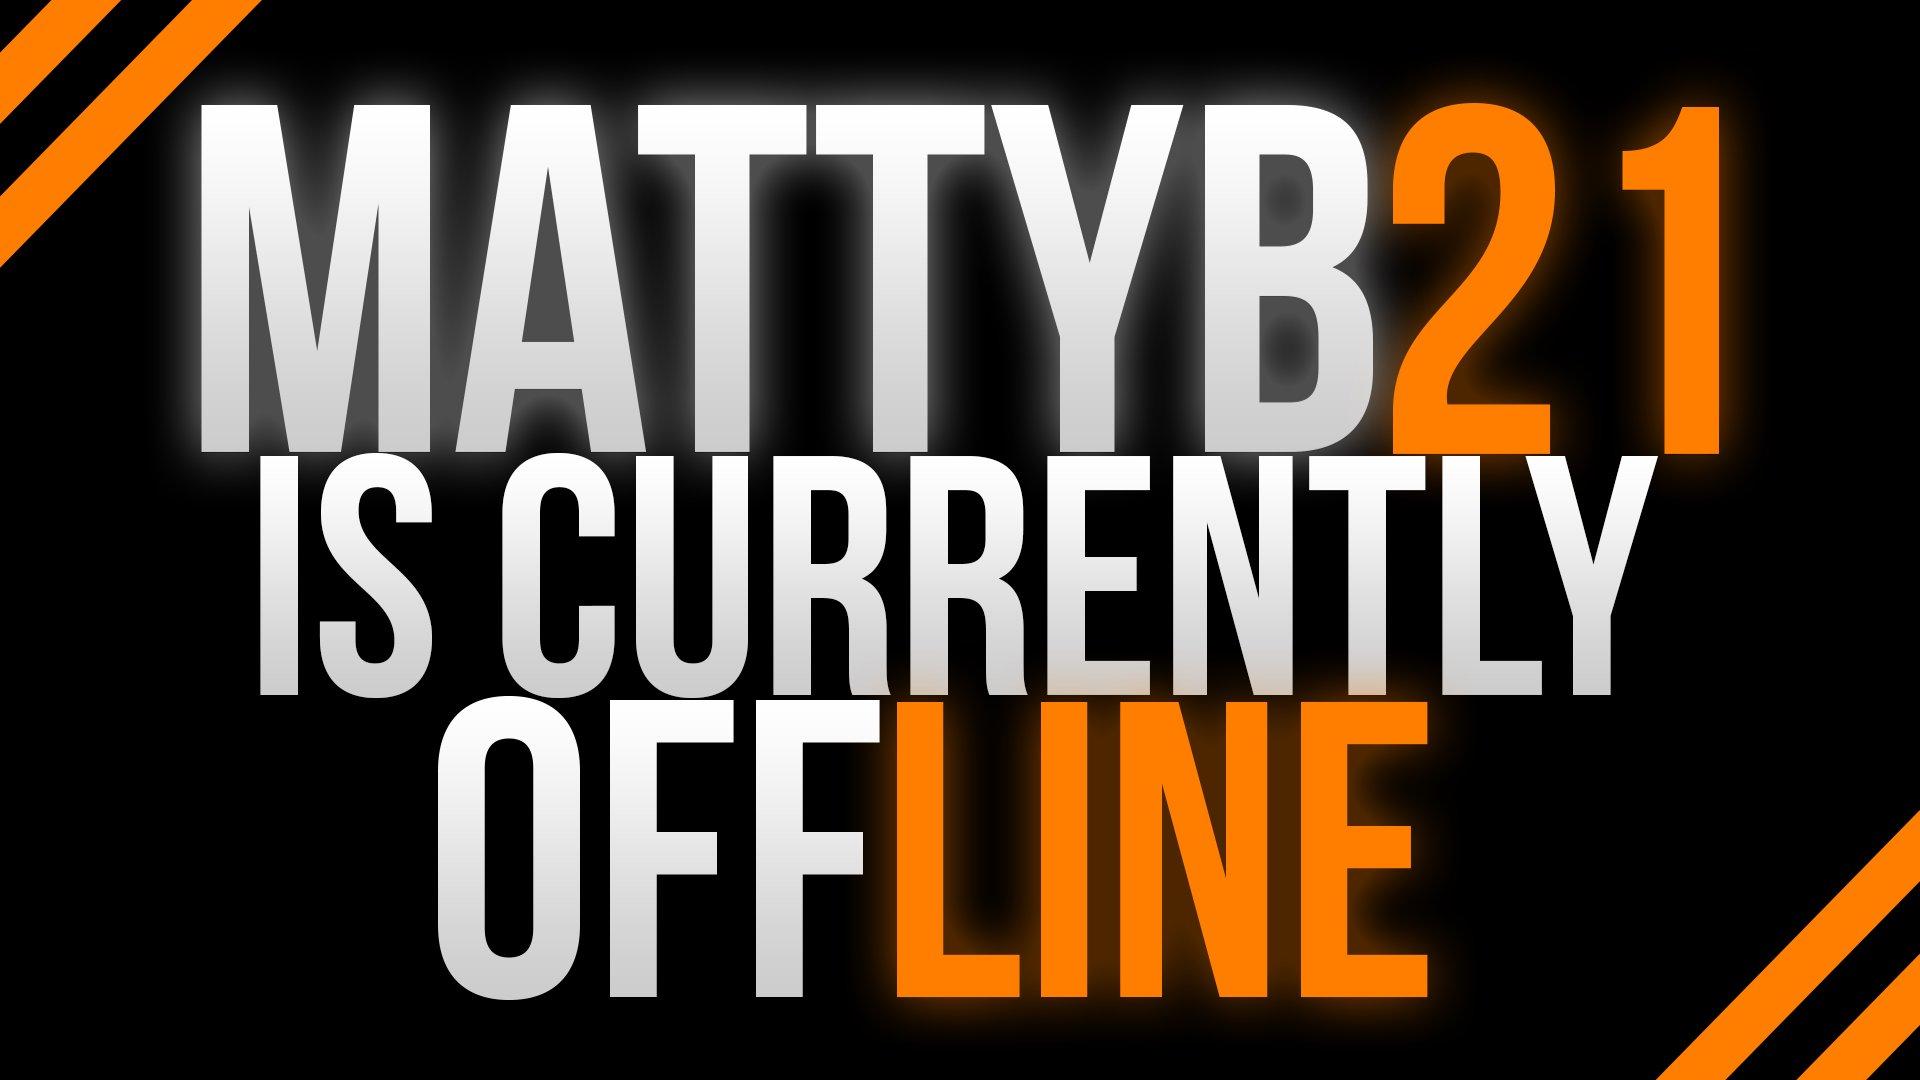 Mattyb21